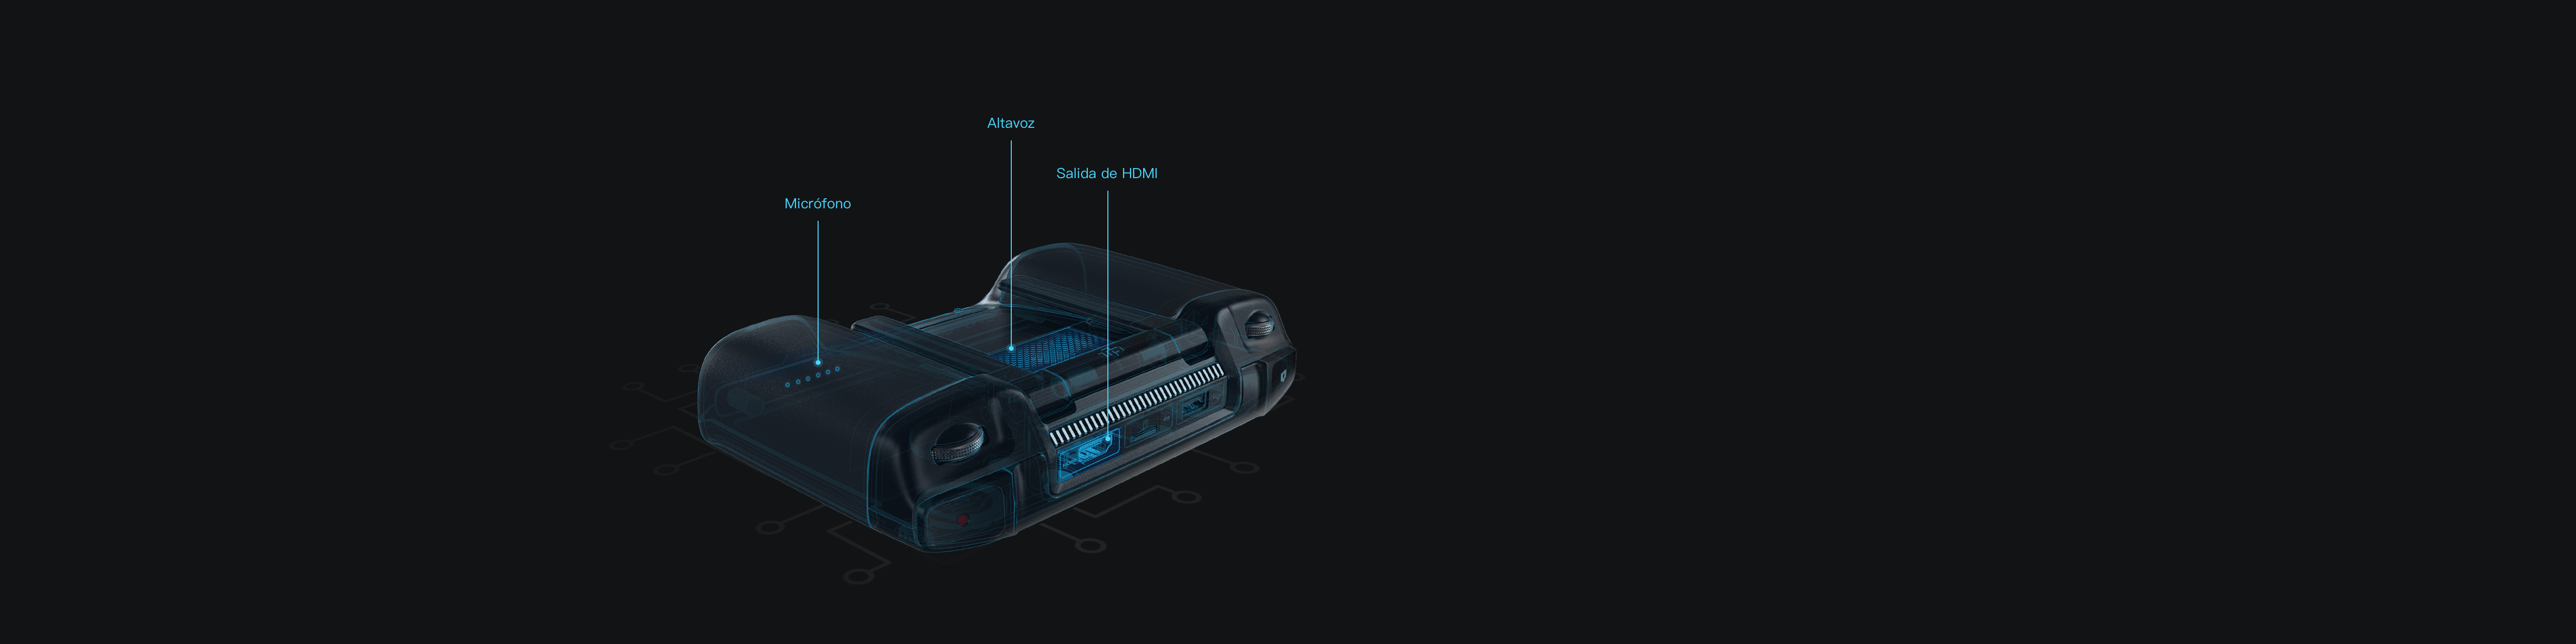 smart-controller-dji-video-sound